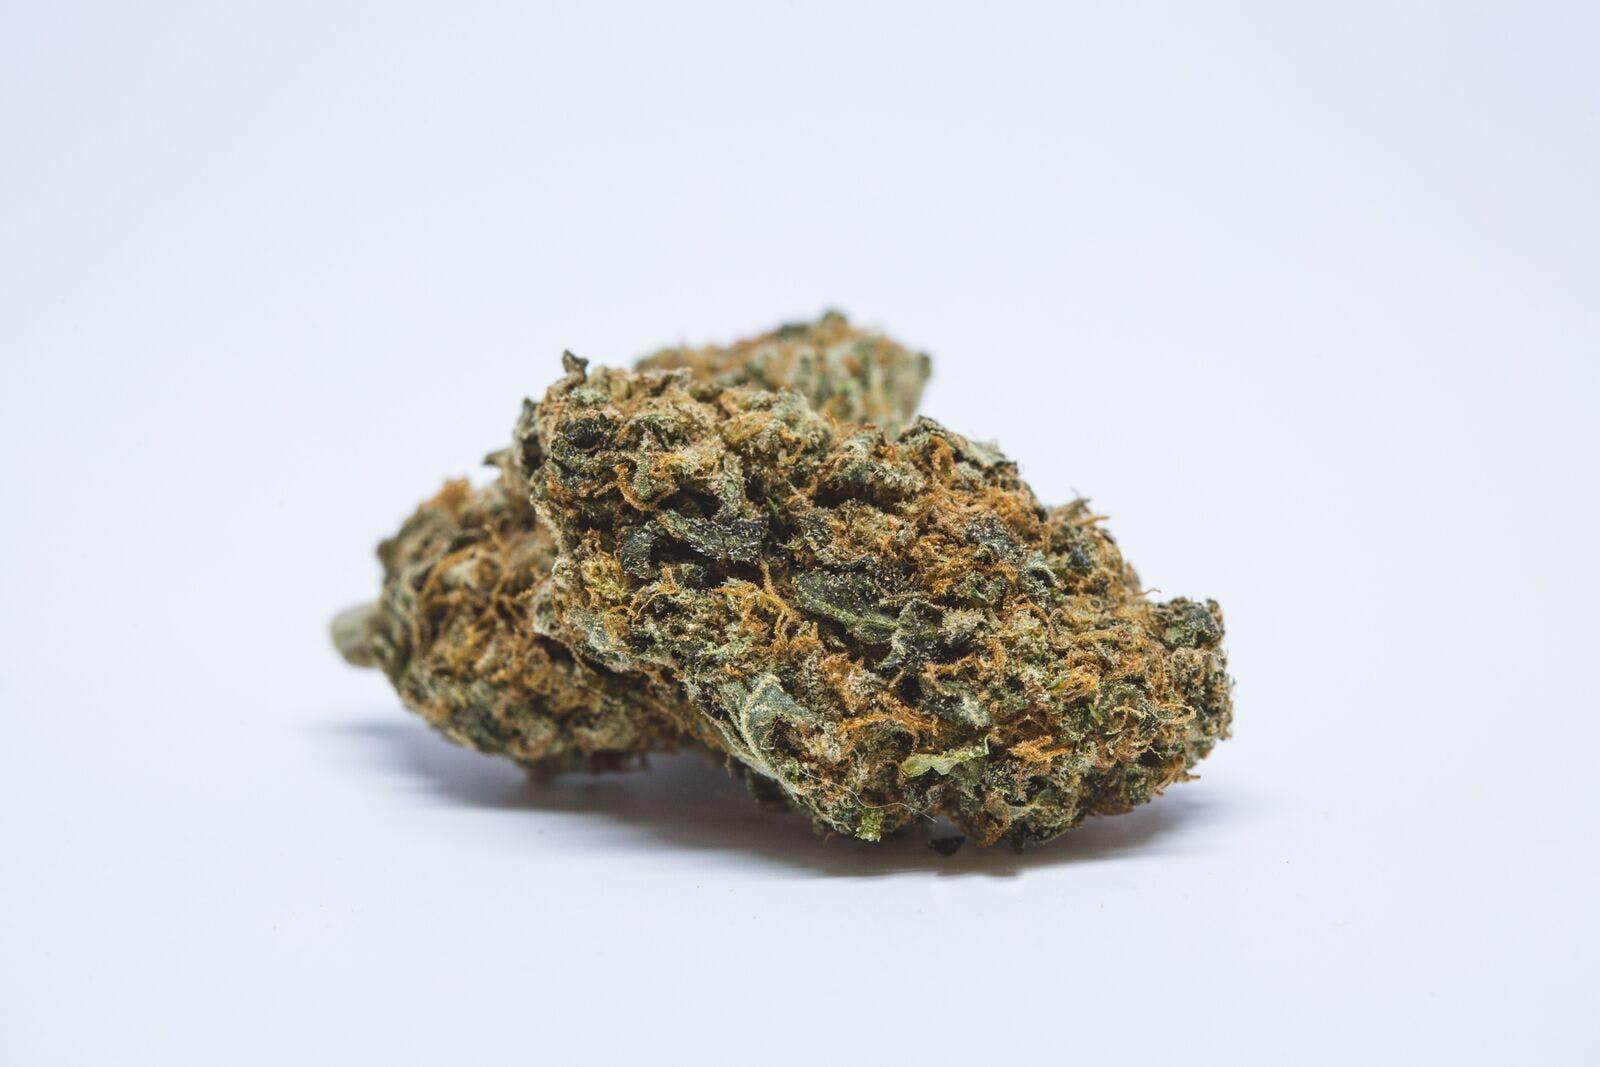 Double Black Weed; Double Black Cannabis Strain; Double Black Indica Marijuana Strain